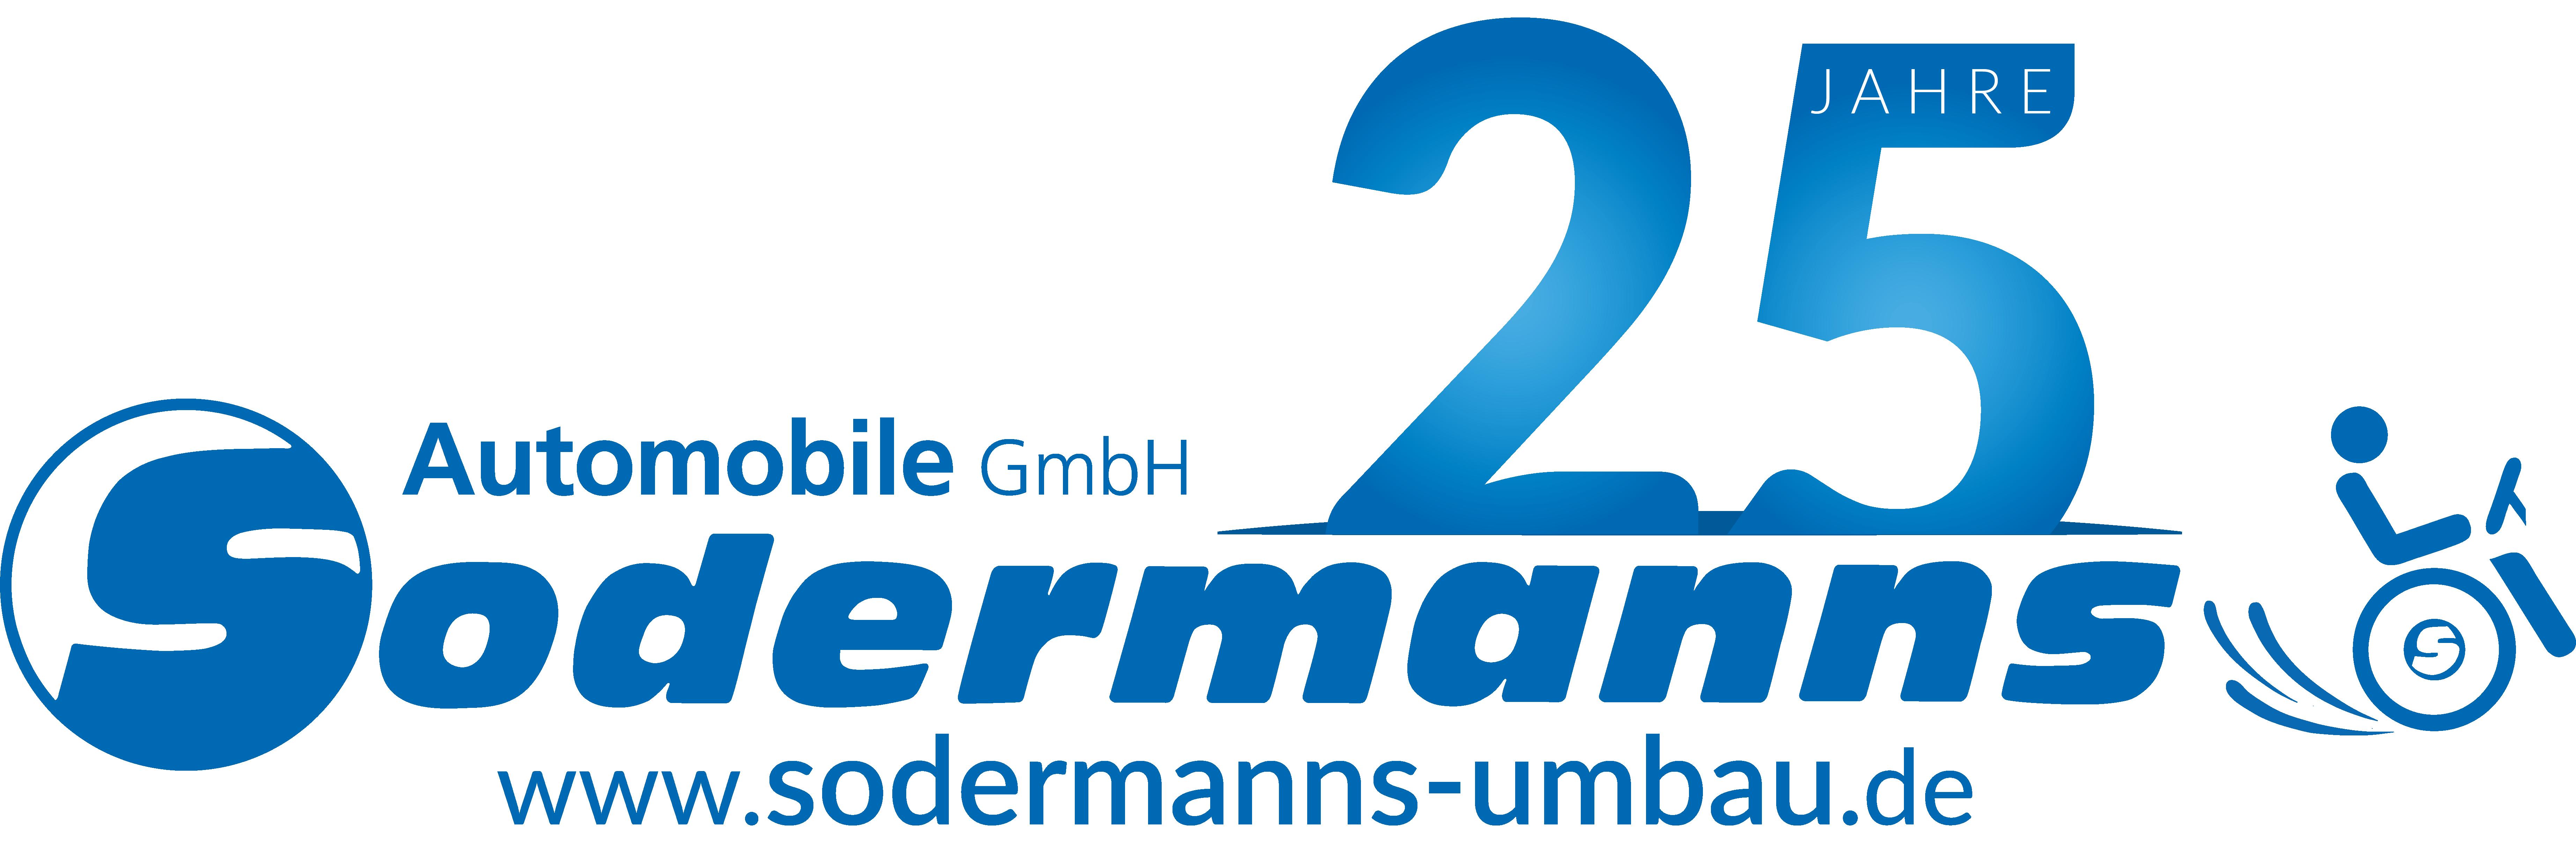 Logo Automobile Sodermanns Behindertengerechte Fahrzeuge Autos